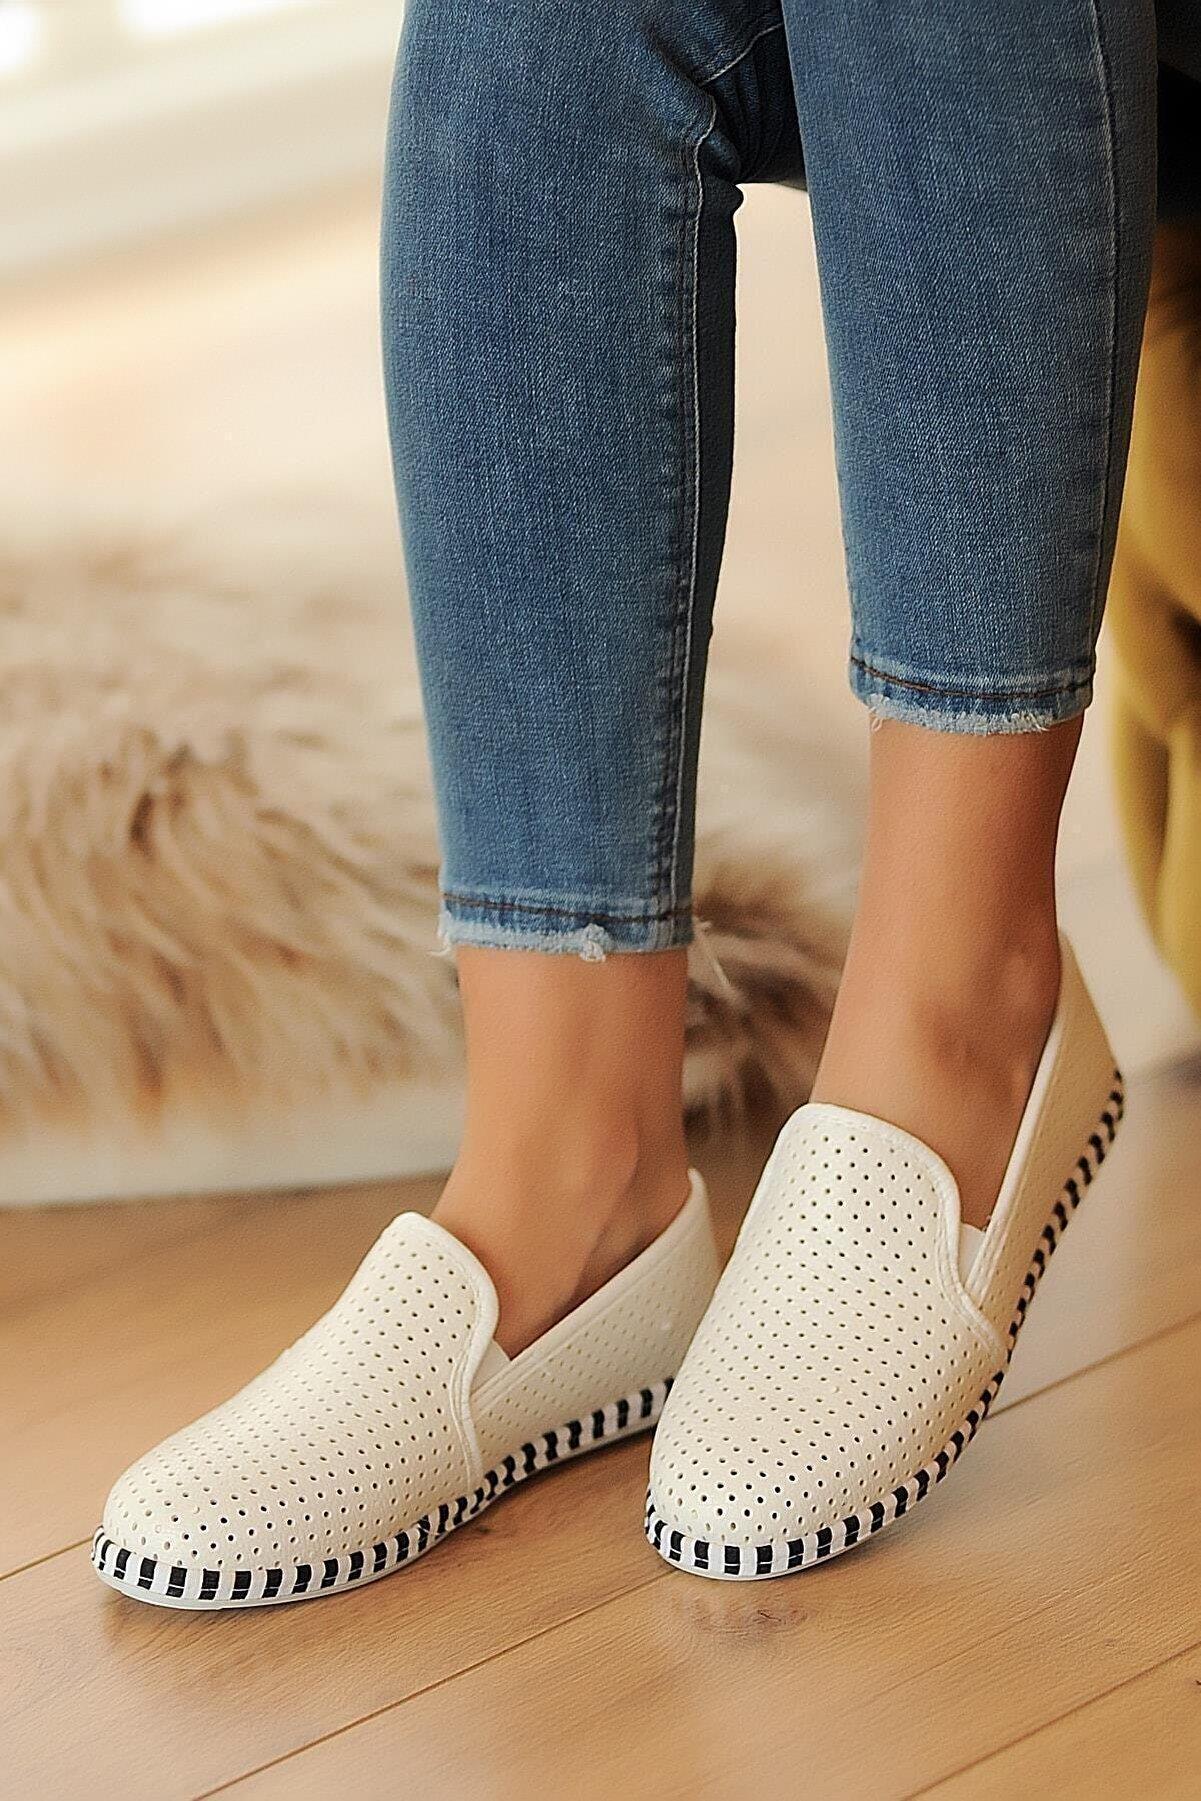 Beyond  Beyaz Deri Delikli Rahat Taban Casual Sneakers Ayakkabı Byndgur01